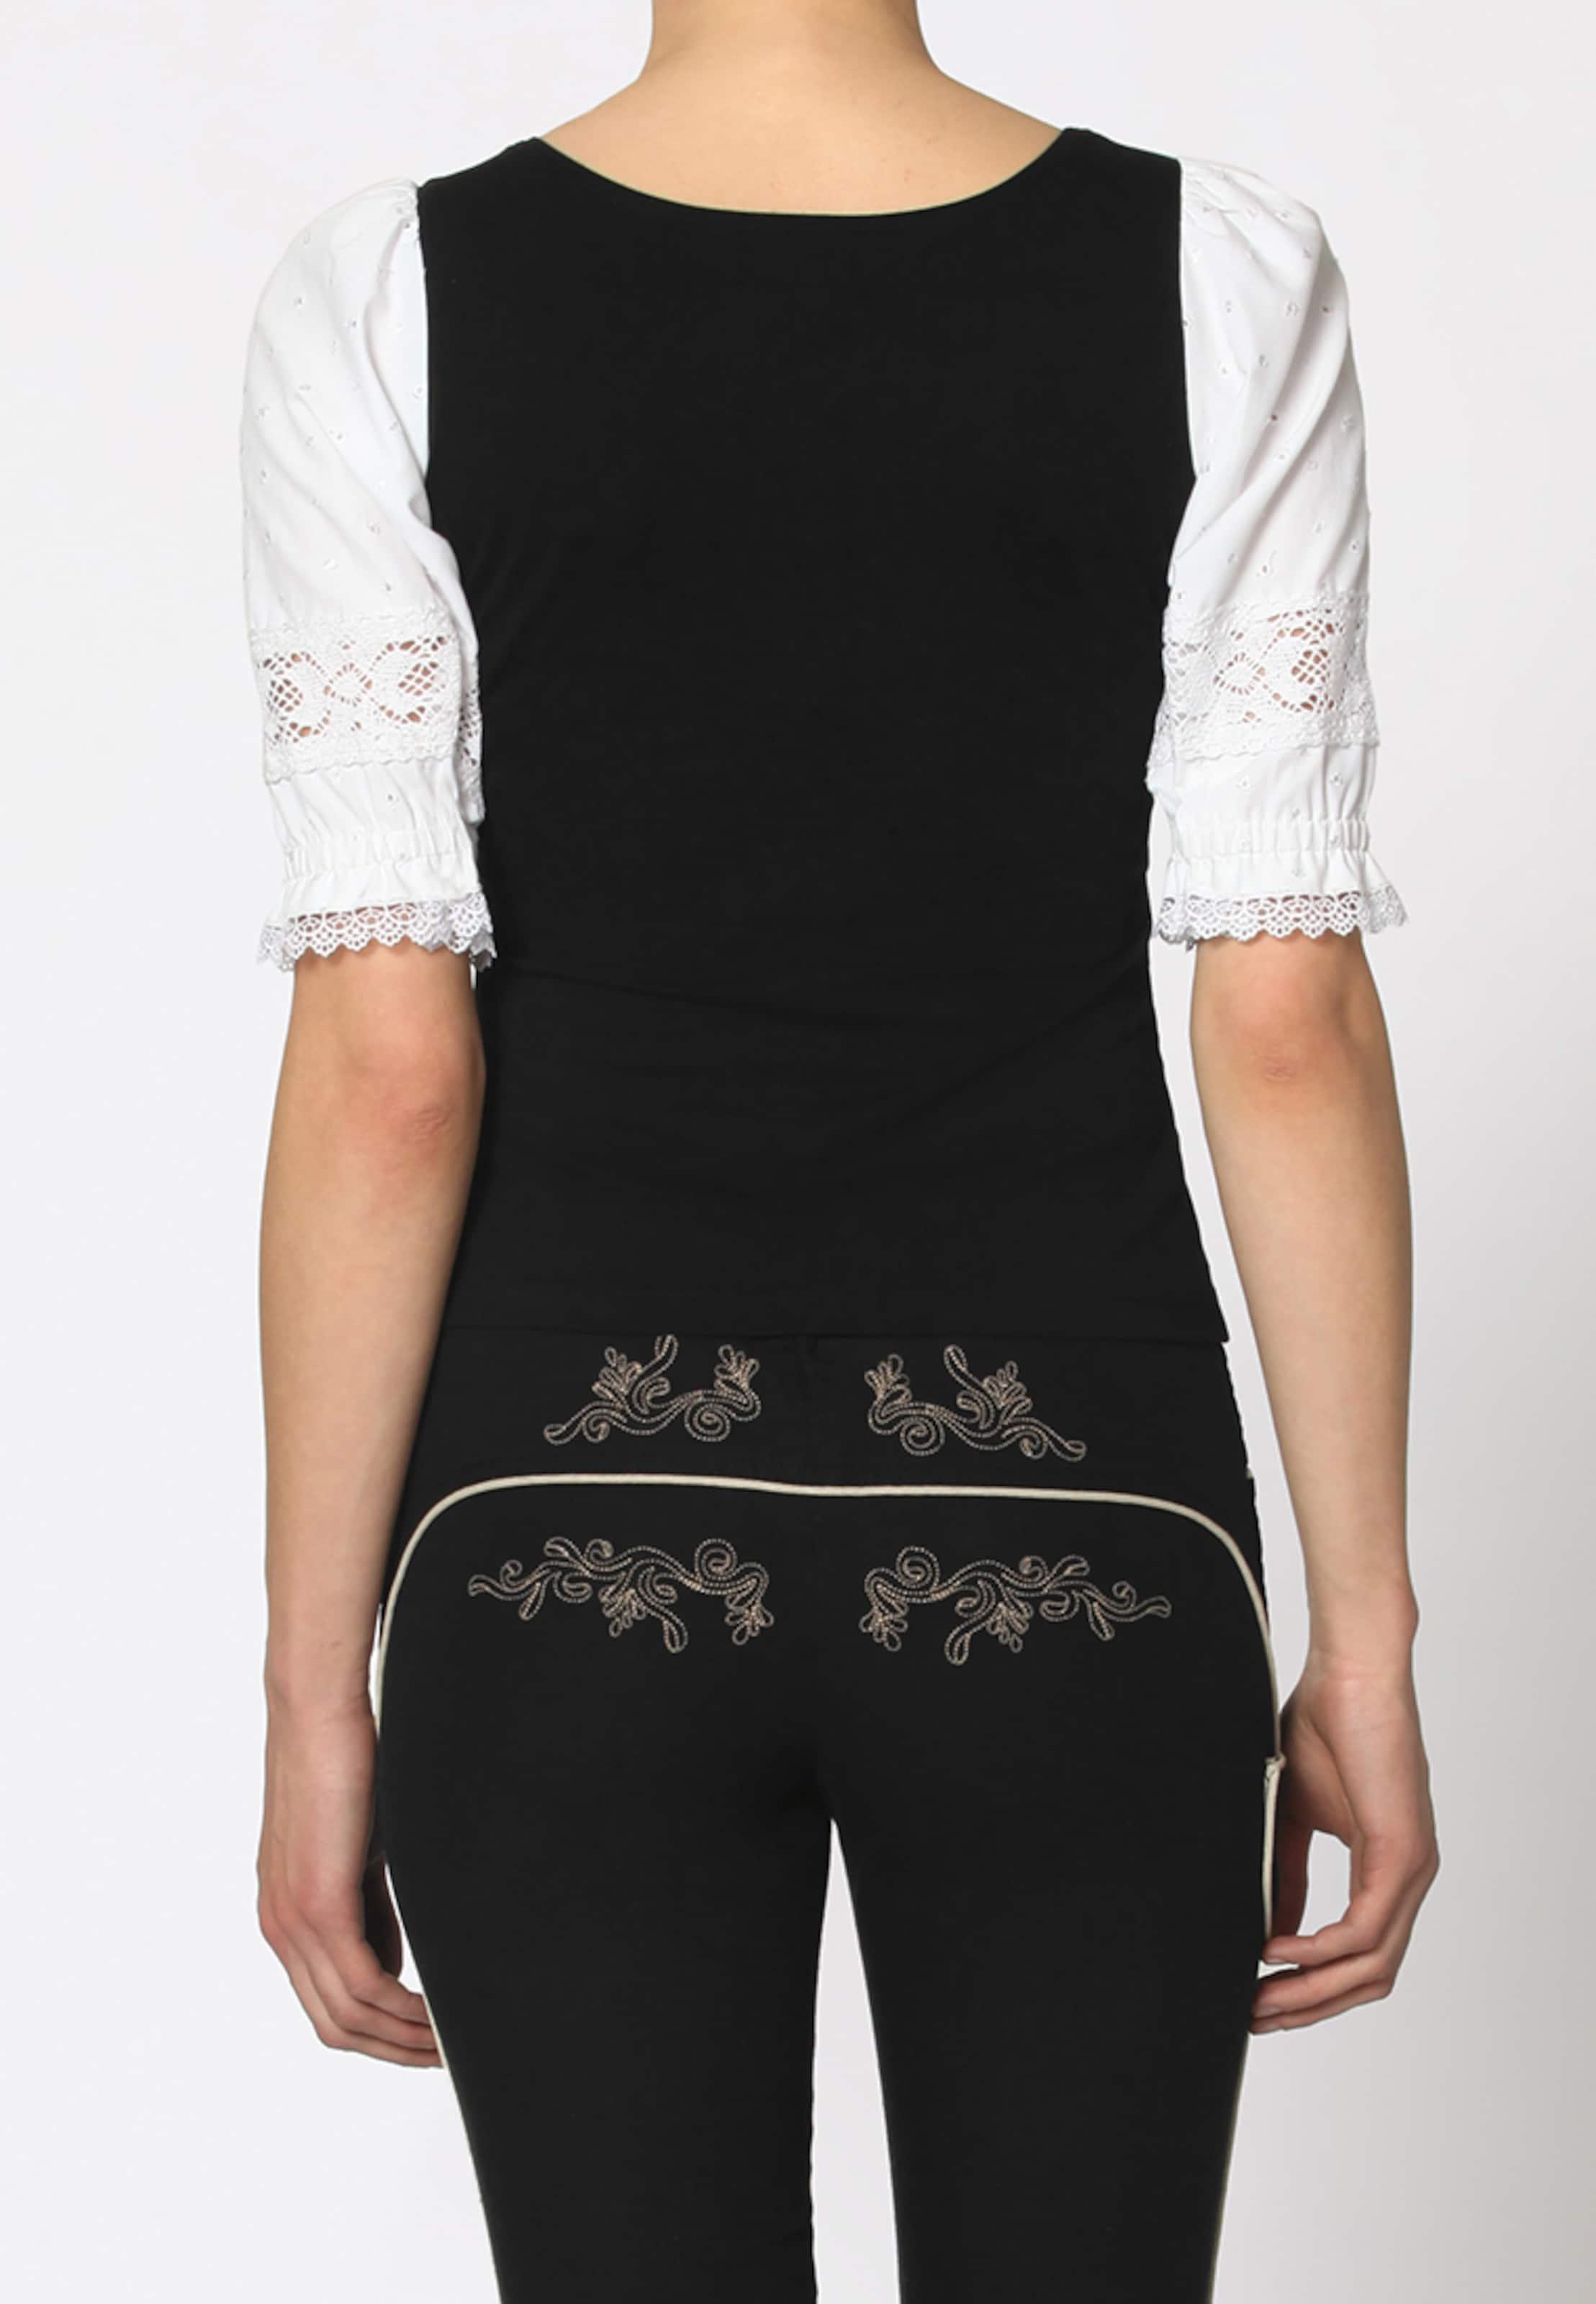 Shirt Weiß Stockerpoint In 'uki2' NudeSchwarz dxQroBeWC